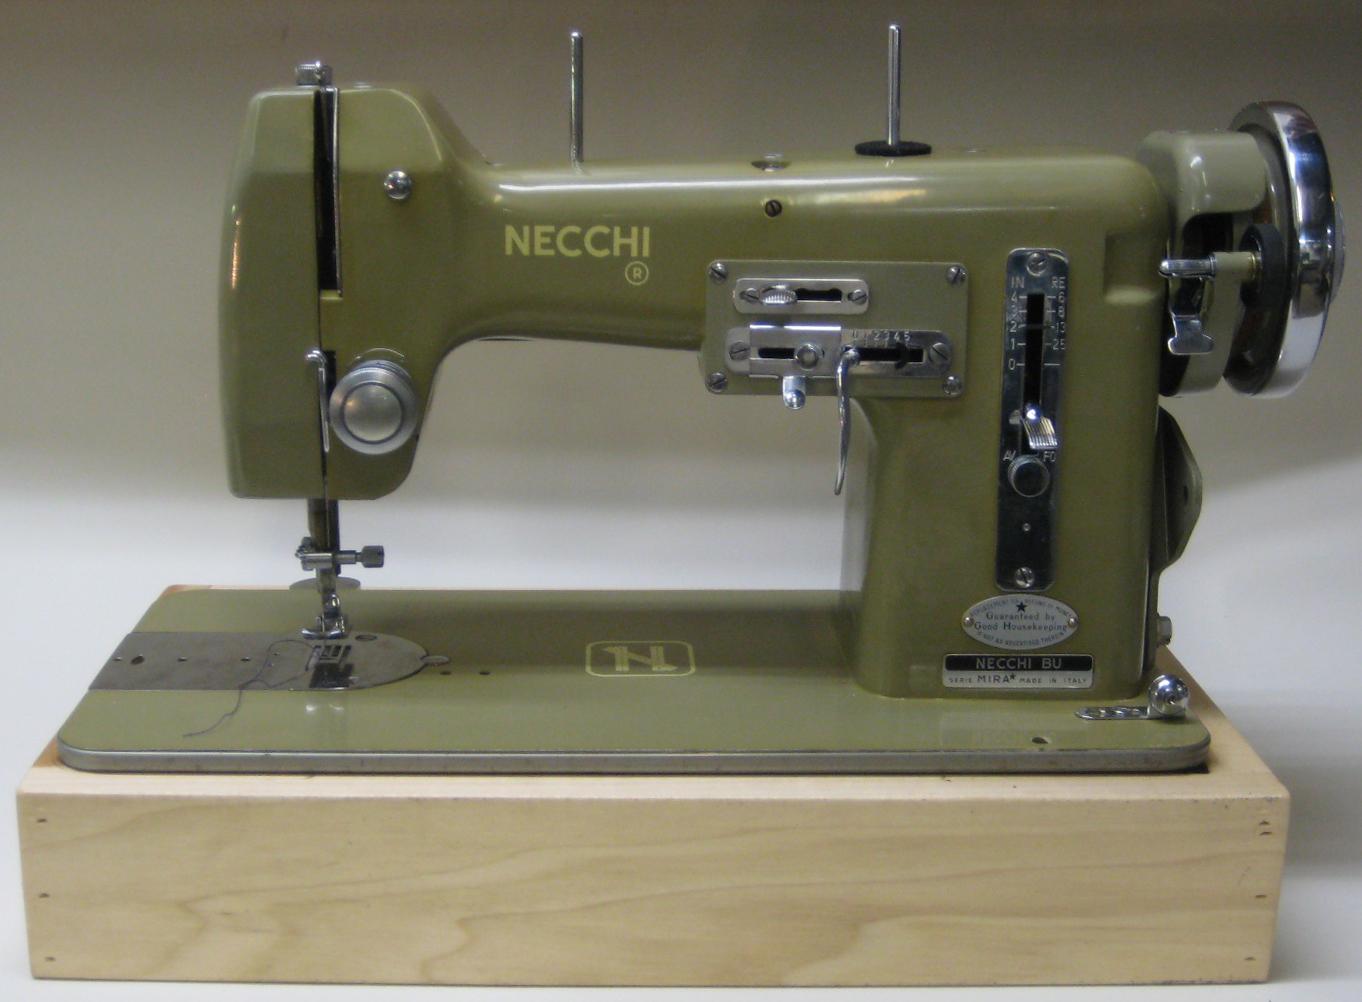 MI Vintage Sewing Machines: Necchi BU Mira (1954) on